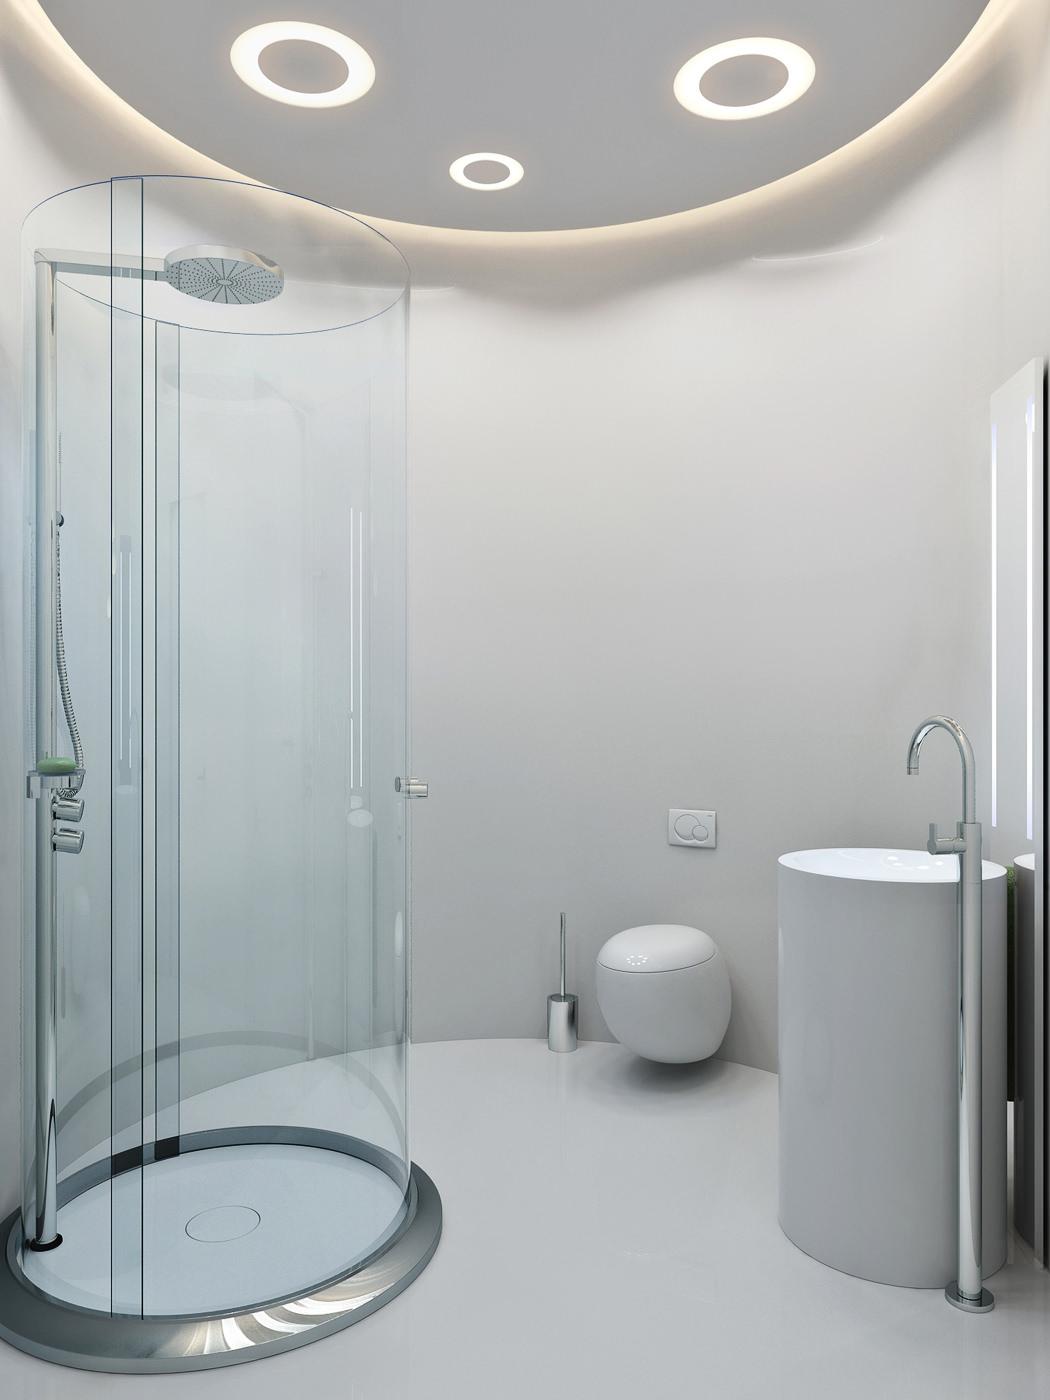 13-Circular-shower-room